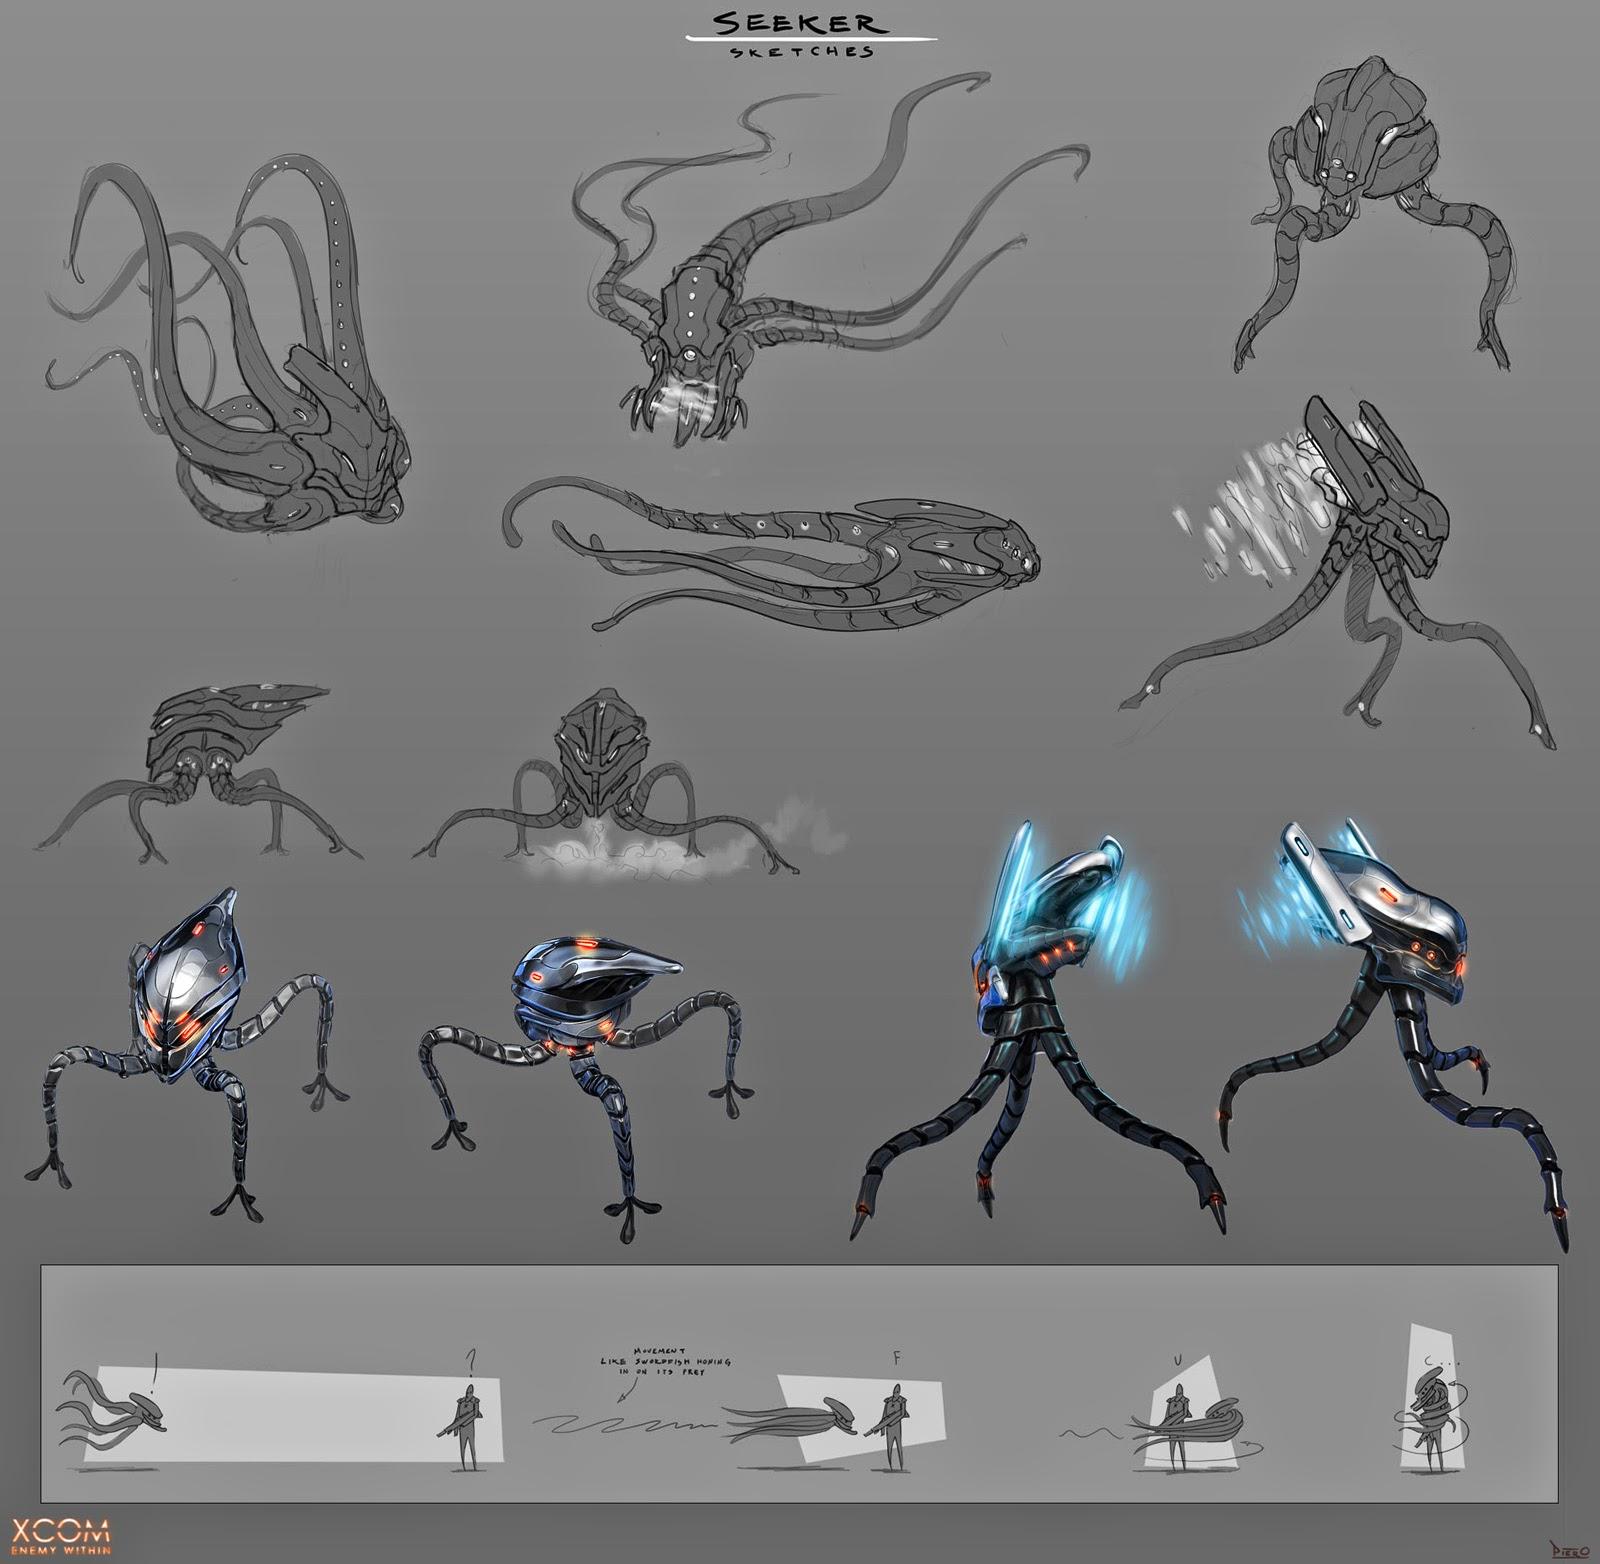 Image - XCOM EW ConceptArt SeekerSketches.jpg